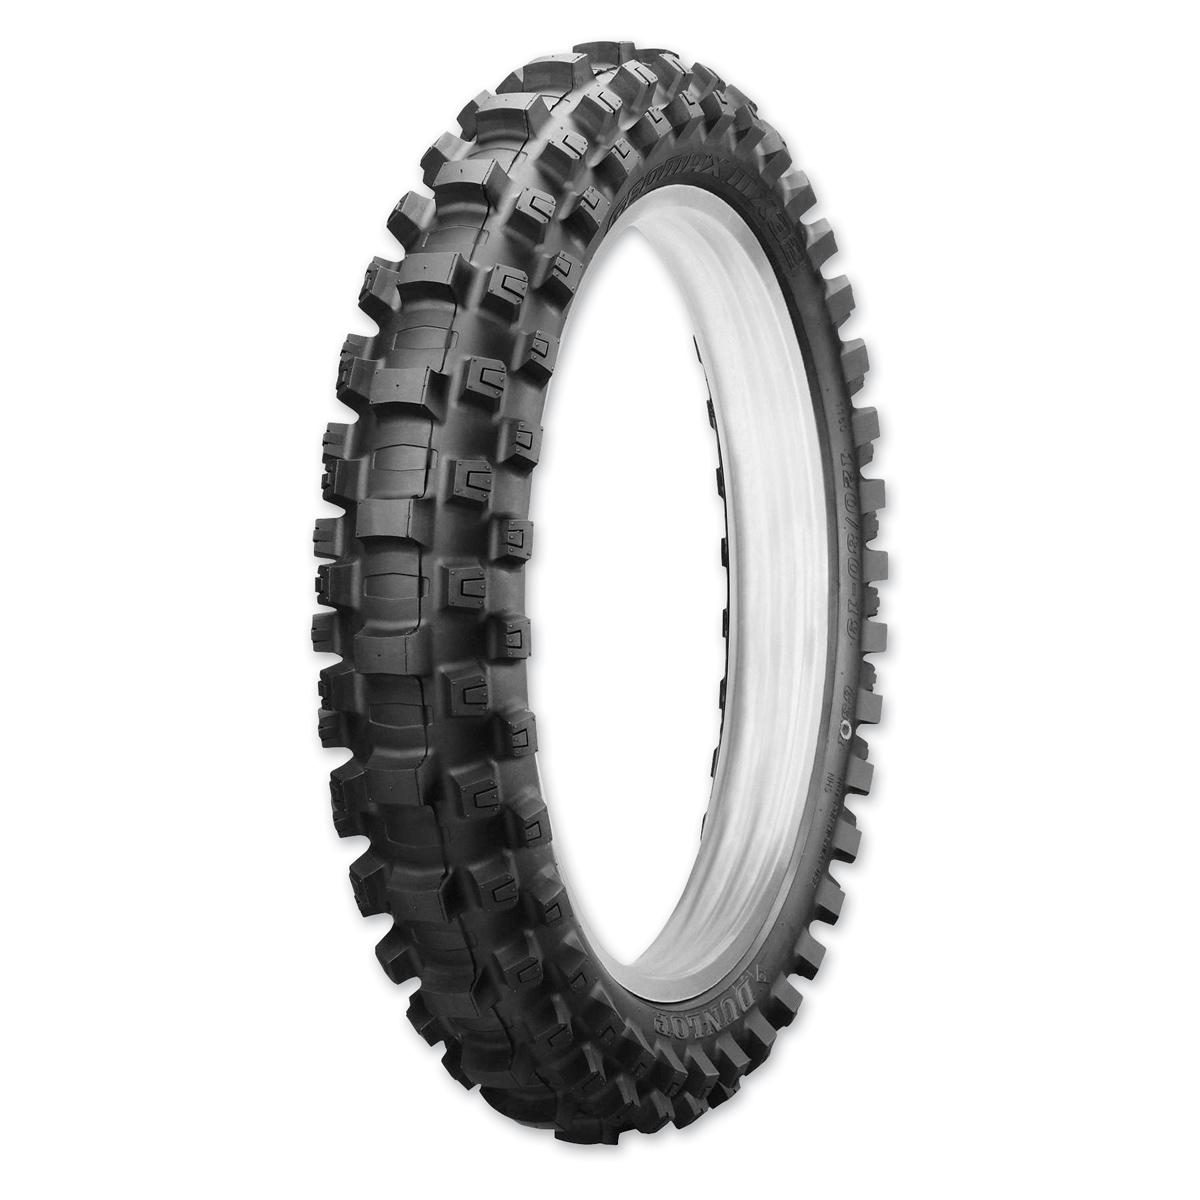 Dunlop MX3S/32 90/100-14 S/T-I/T Rear Tire